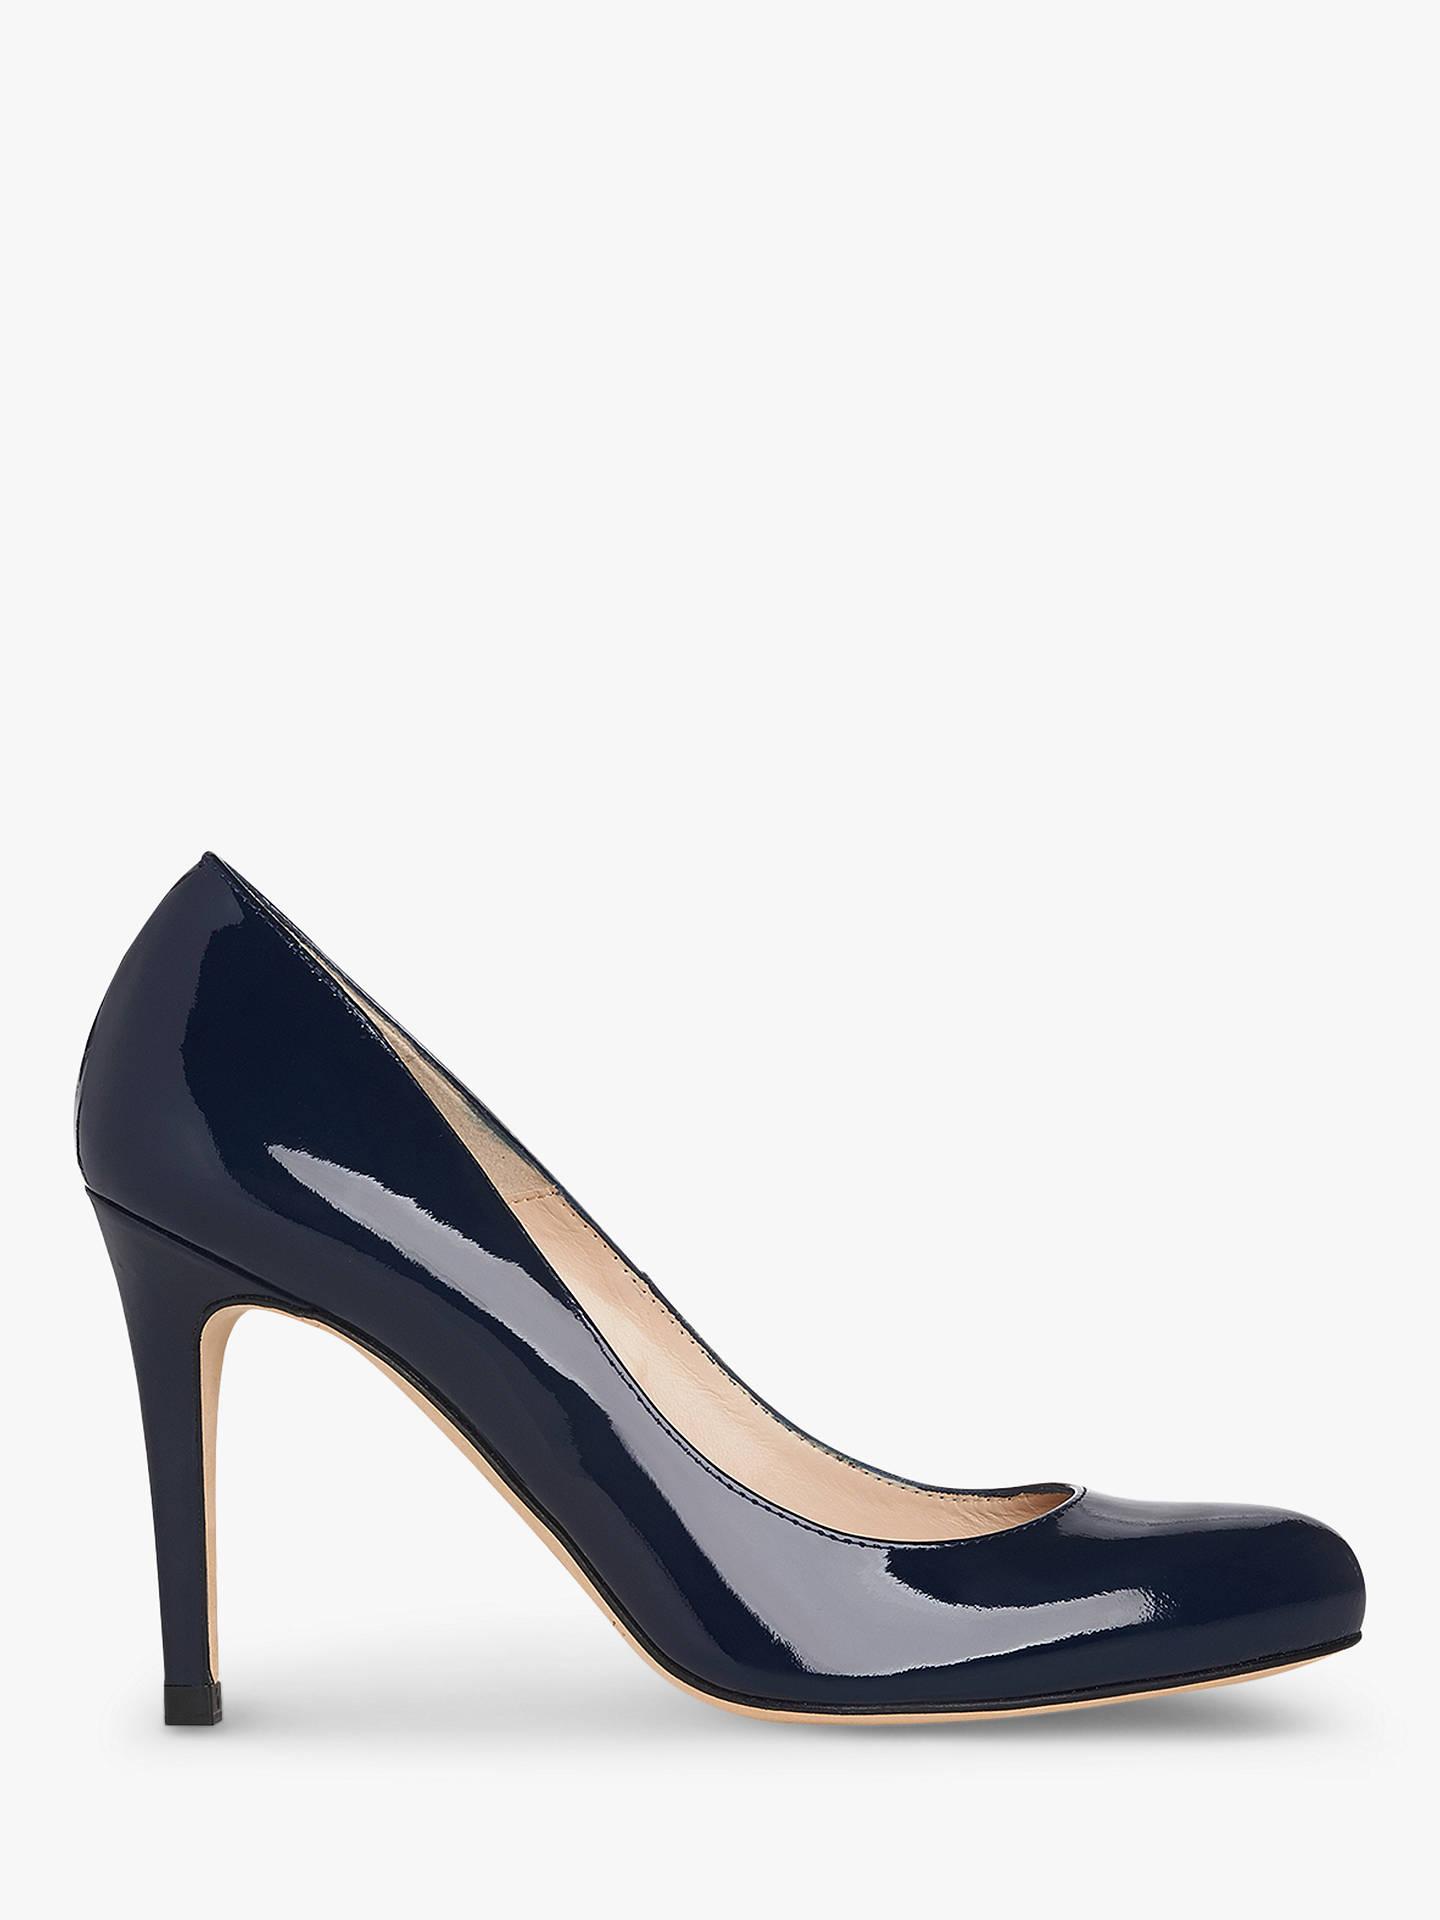 baed3c55e75 L.K.Bennett Stila Patent Leather Court Shoes at John Lewis   Partners